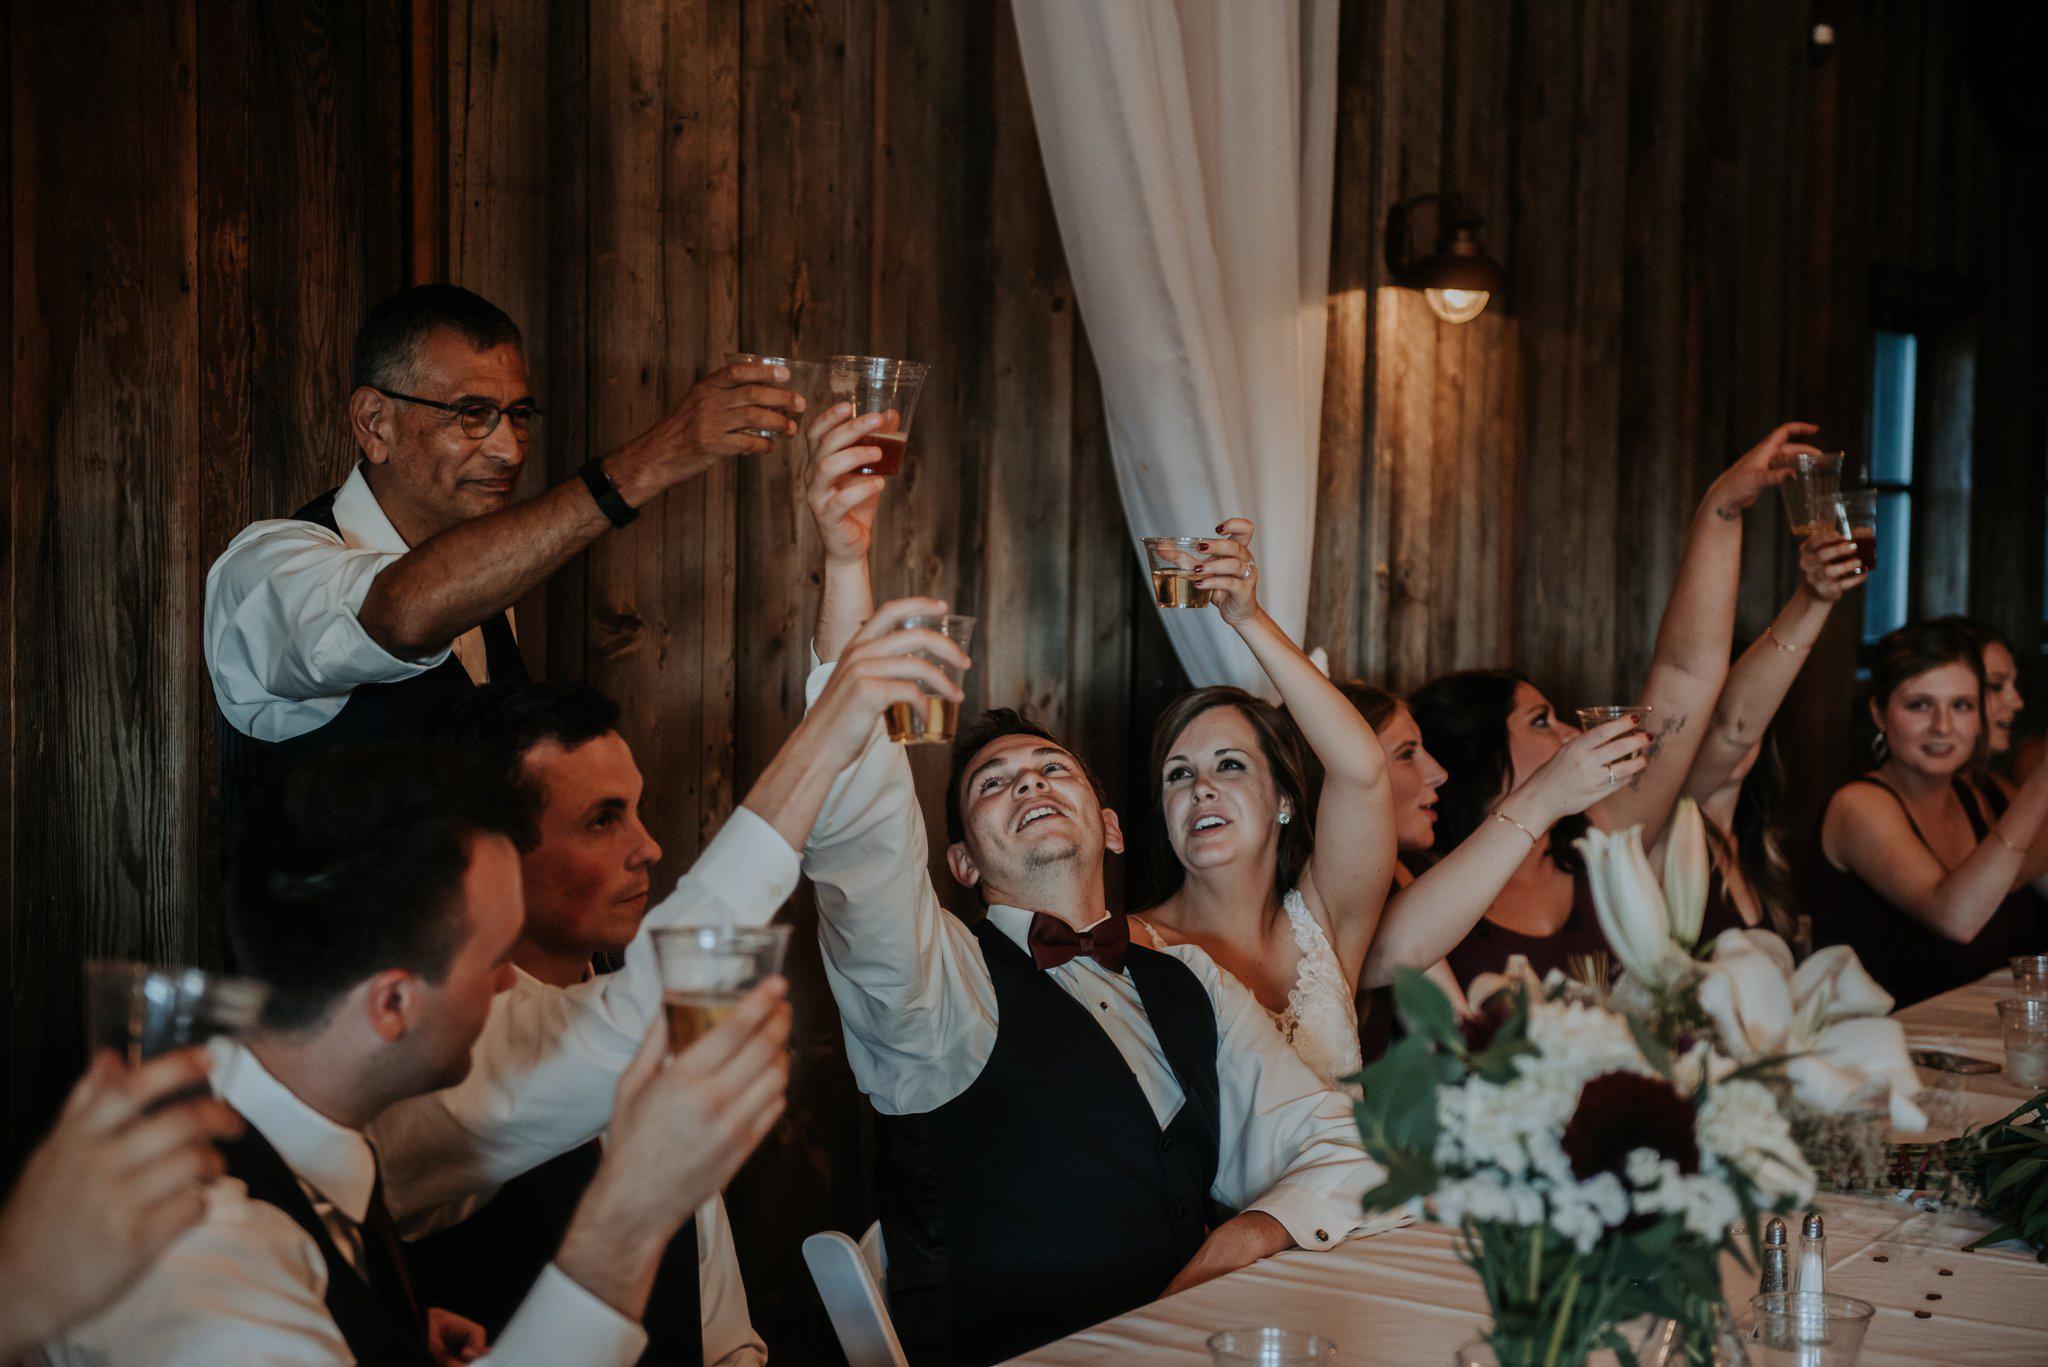 kristen-and-cody-the-kelley-farm-wedding-seattle-photographer-caitlyn-nikula-84.jpg